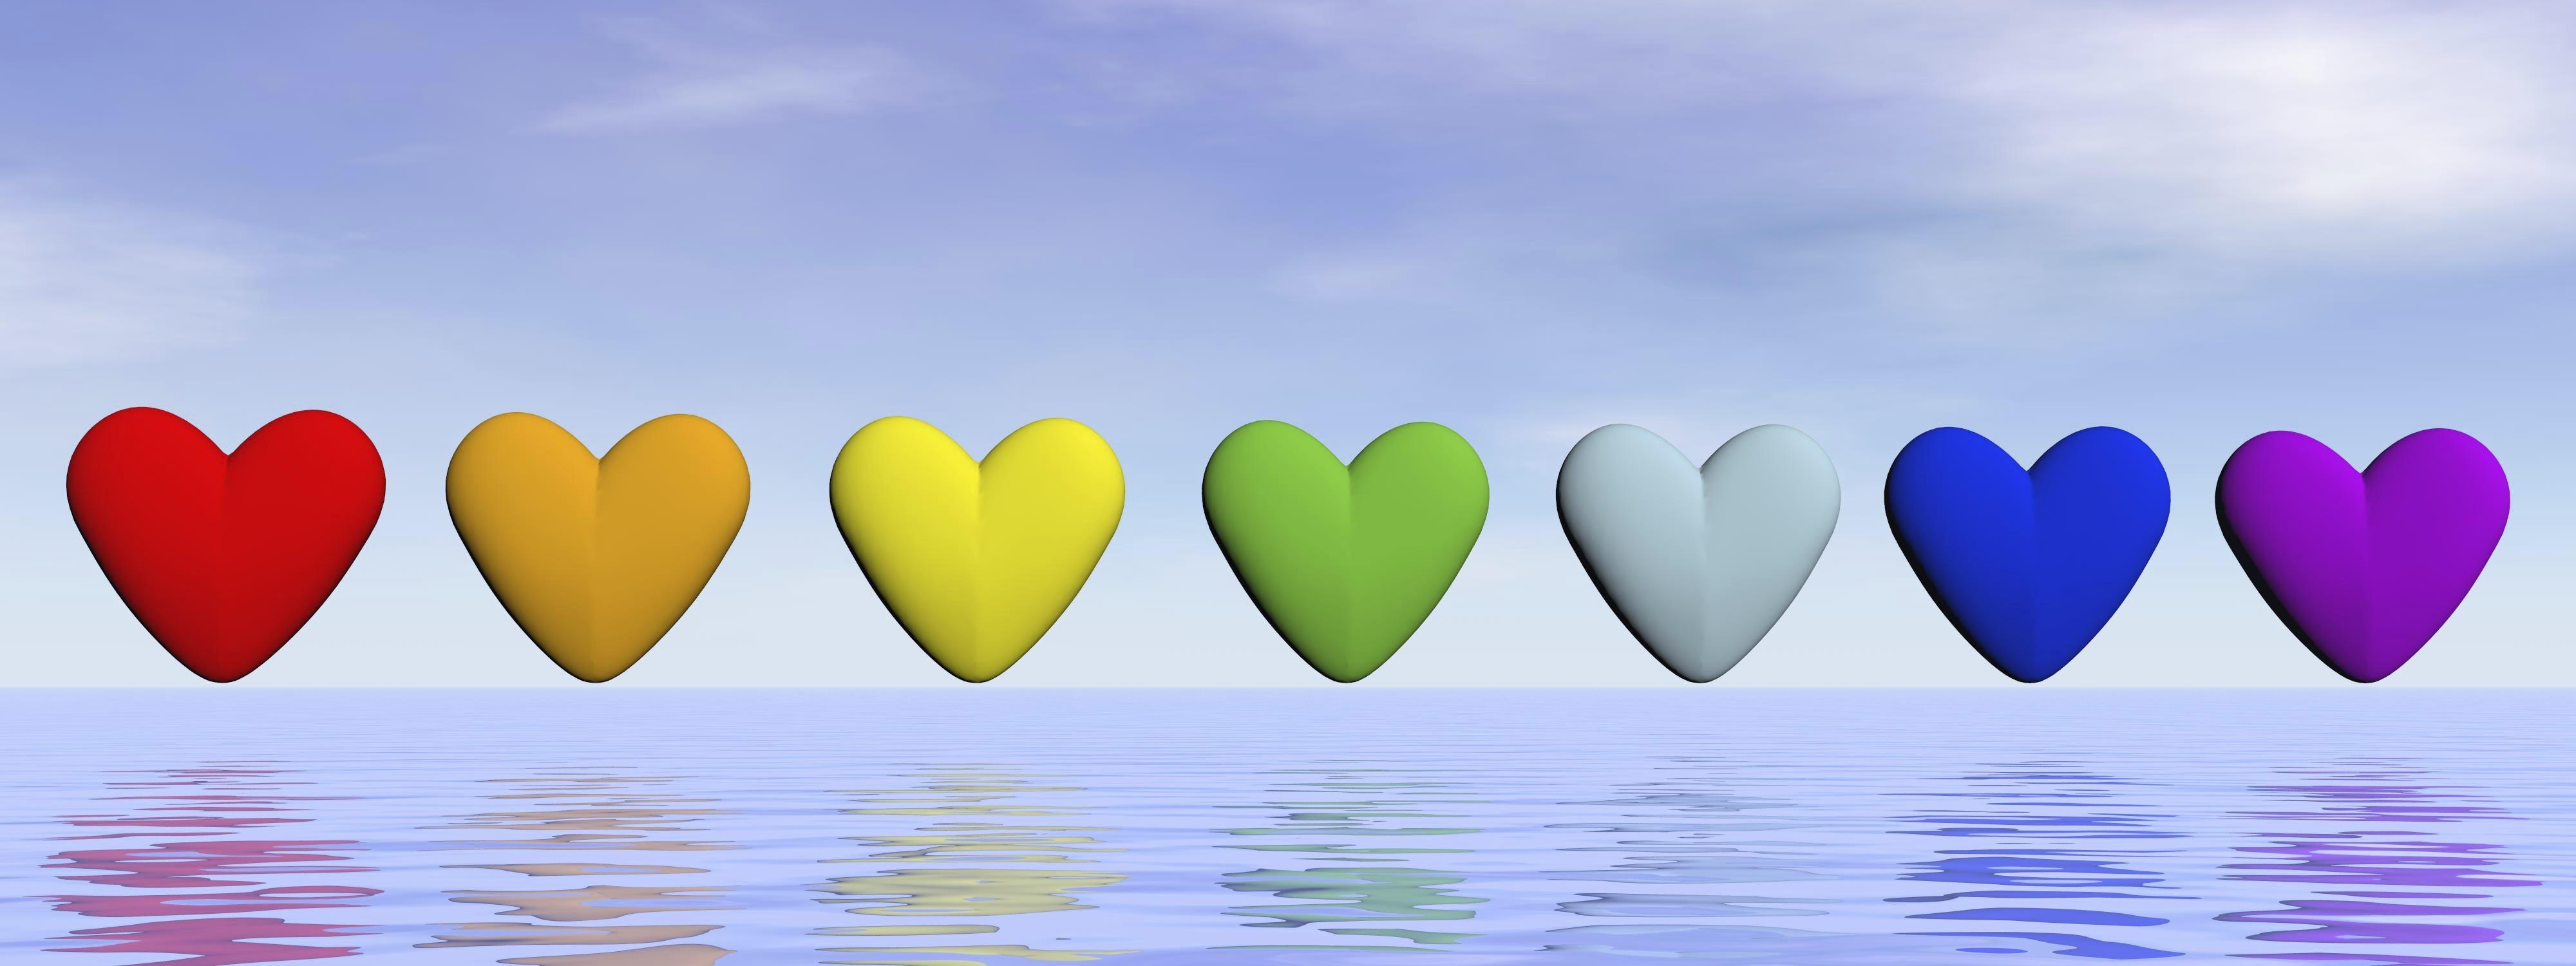 Chakra hearts - 3D render